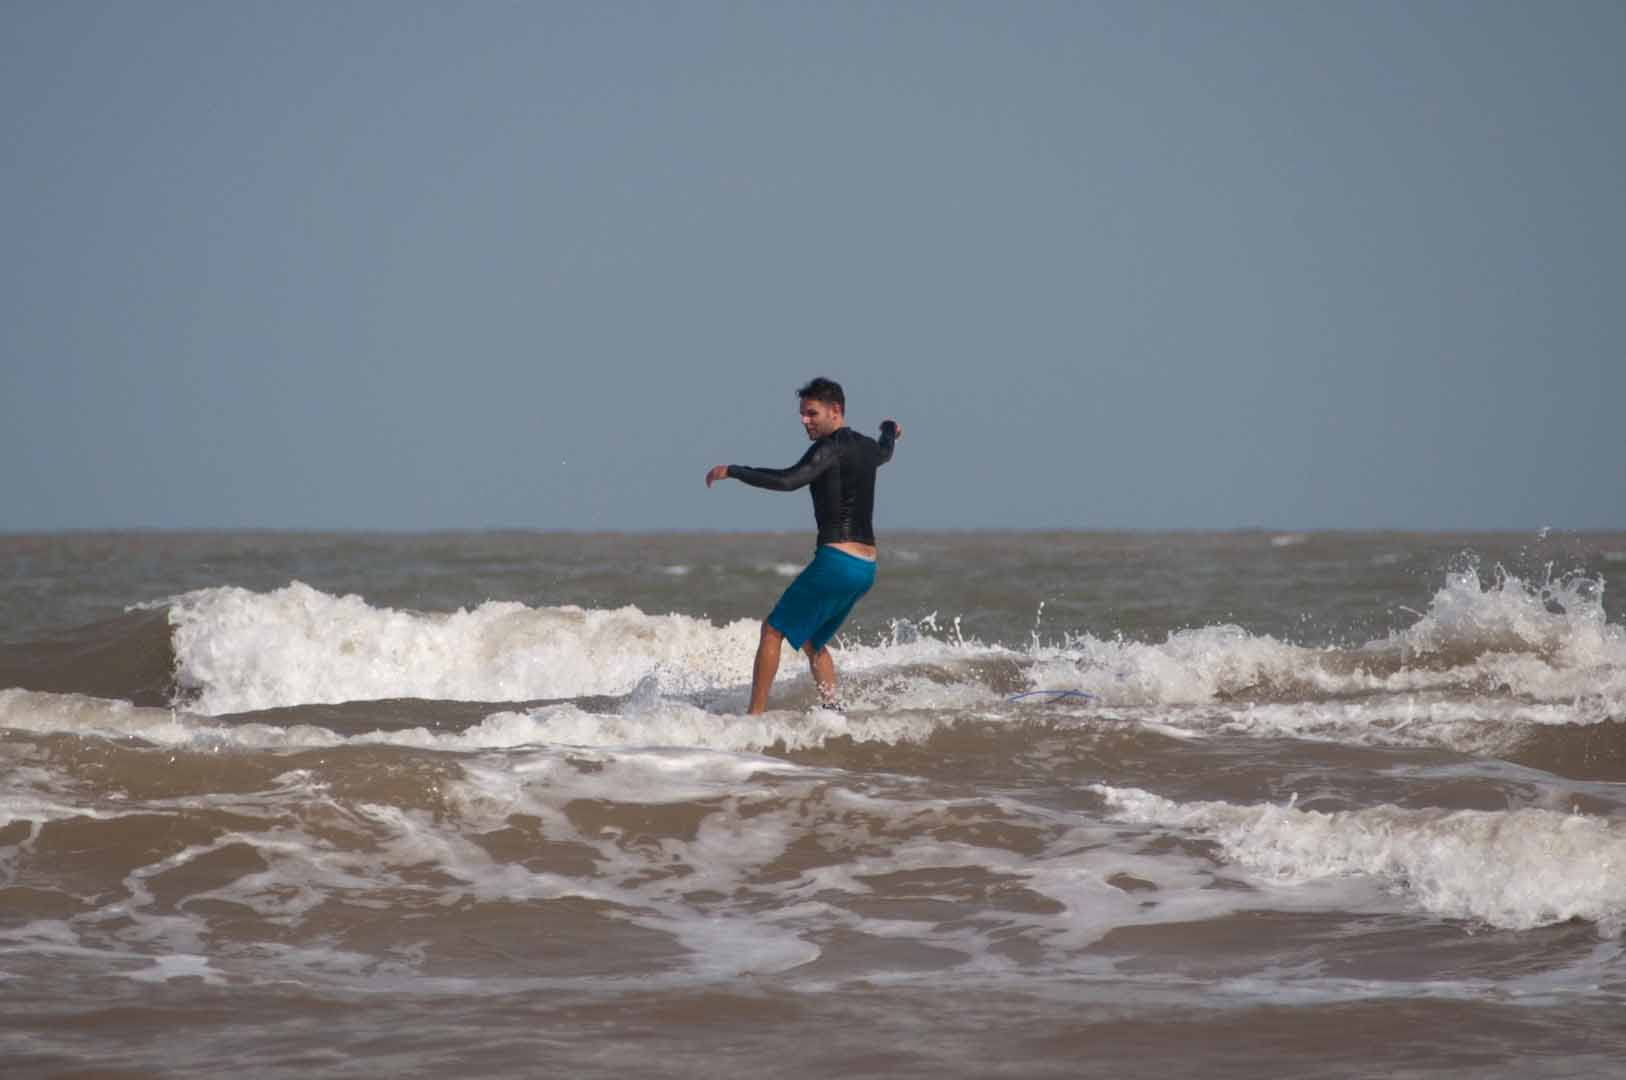 SurfsideJuly2_20150702_138